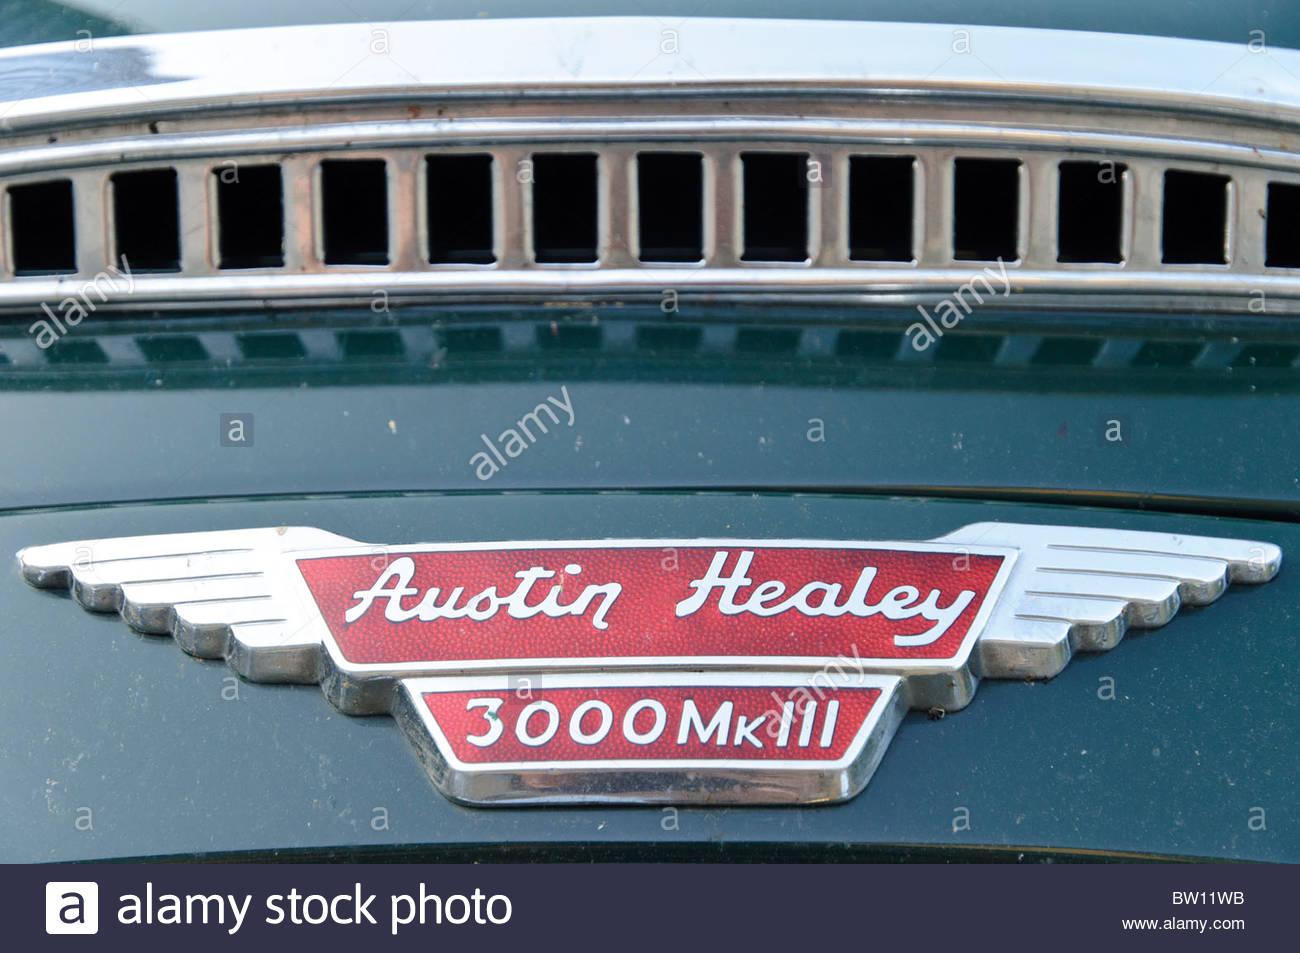 Austin Healey 3000 Mk III, Jena, Thuringia, Germany, Europe - Stock Image